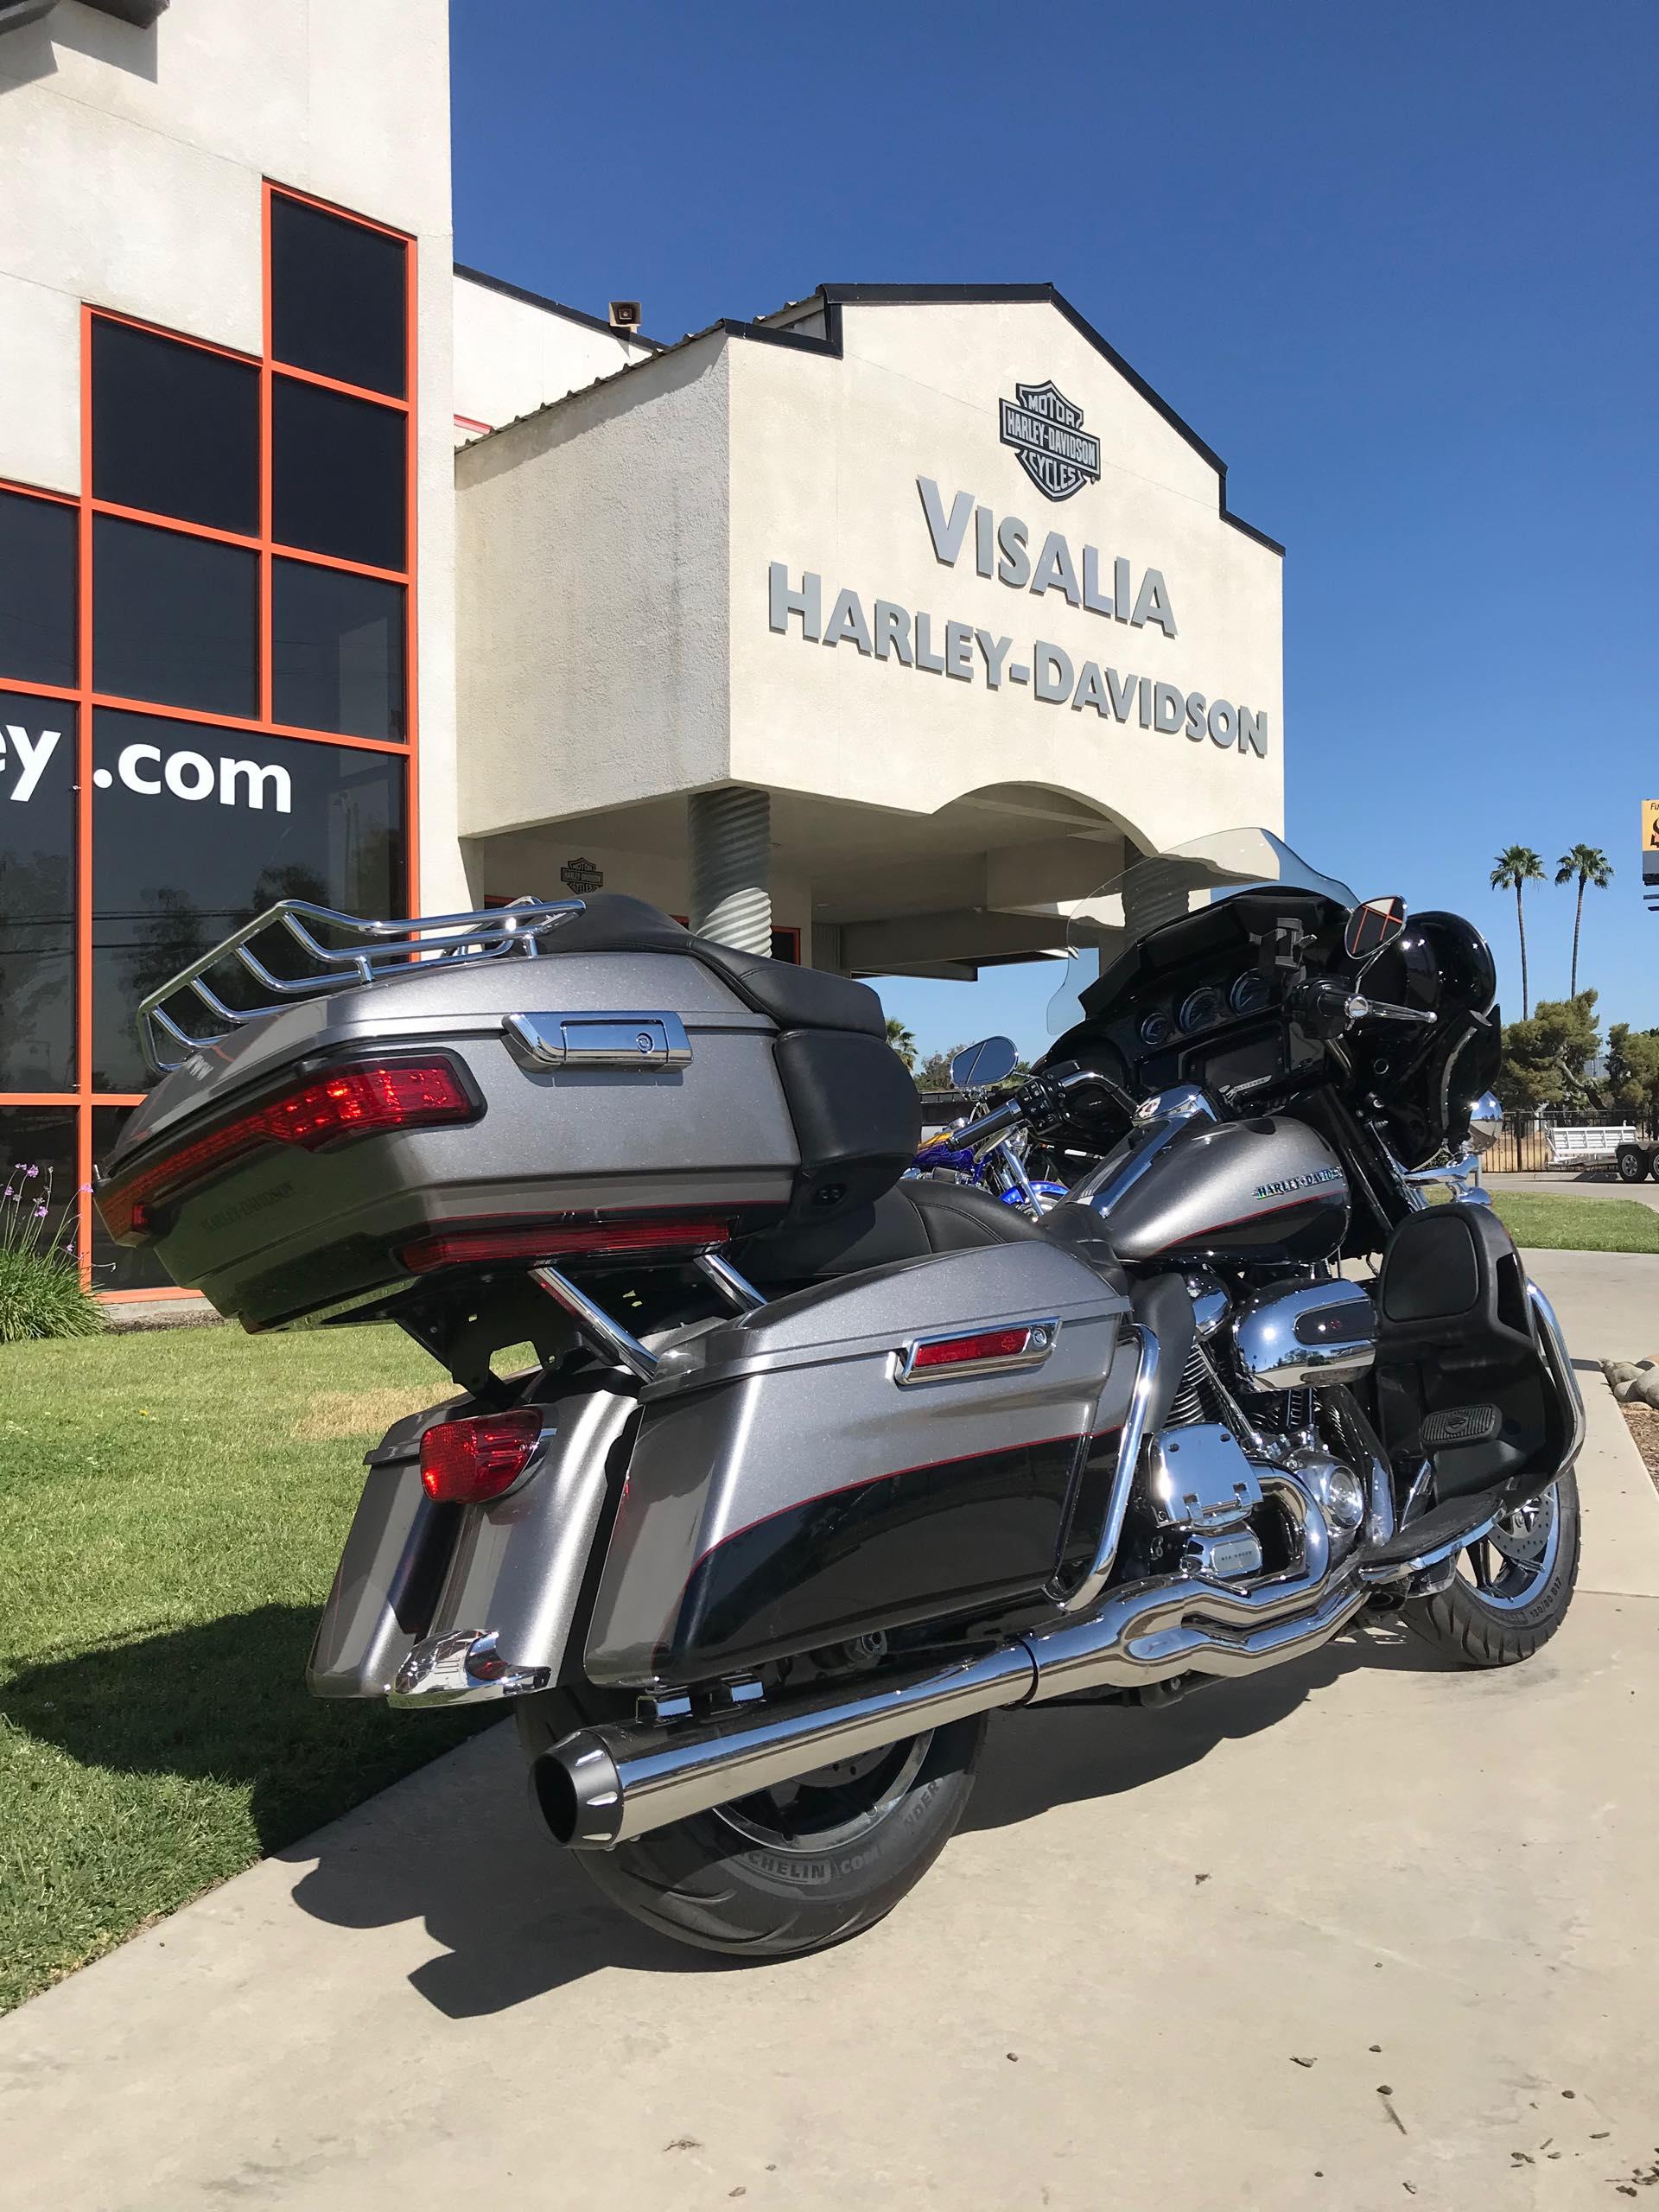 2017 Harley-Davidson Electra Glide Ultra Limited at Visalia Harley-Davidson